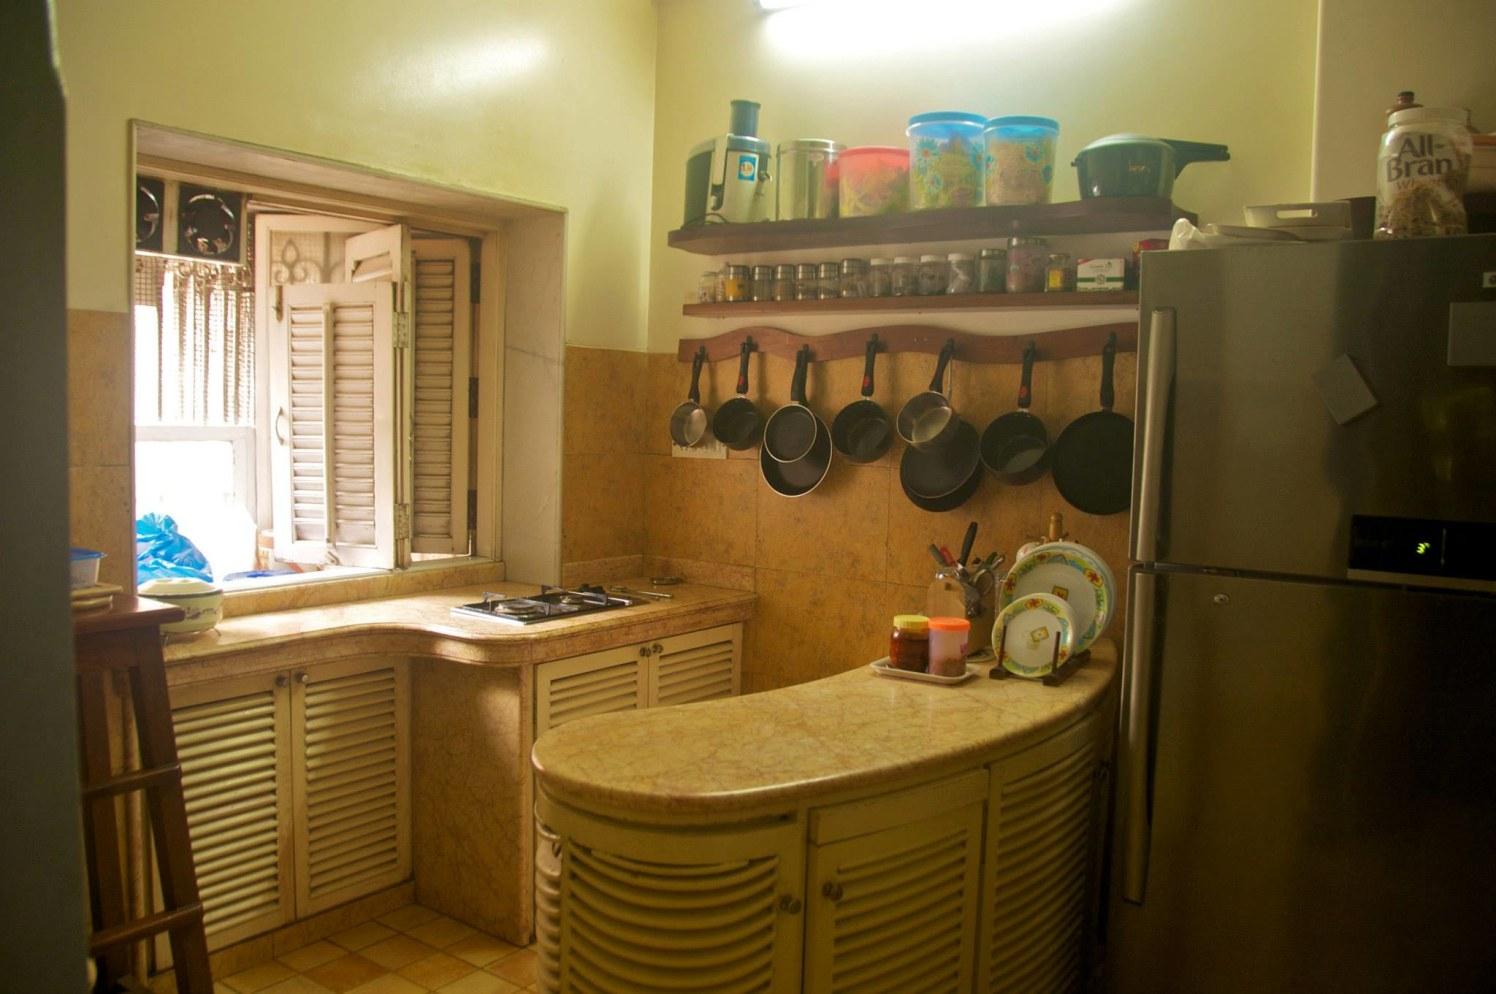 Compact Modular Kitchen with Marble Counter Top by Viraf Laskari  Modular-kitchen Minimalistic   Interior Design Photos & Ideas